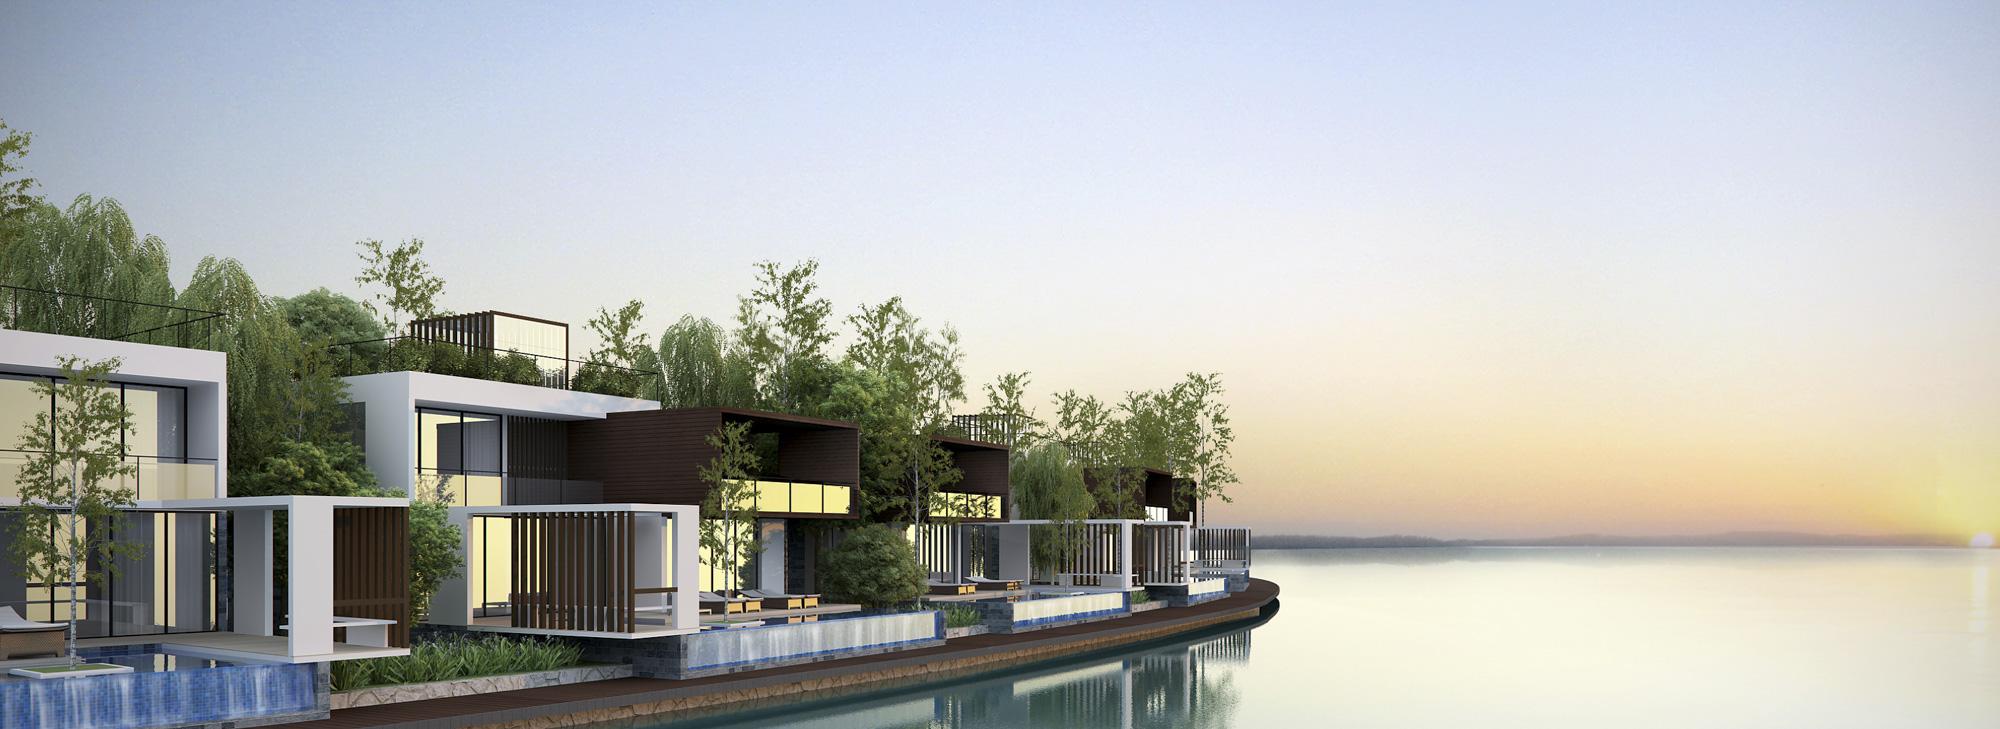 Song Hau Residence Exterior 3